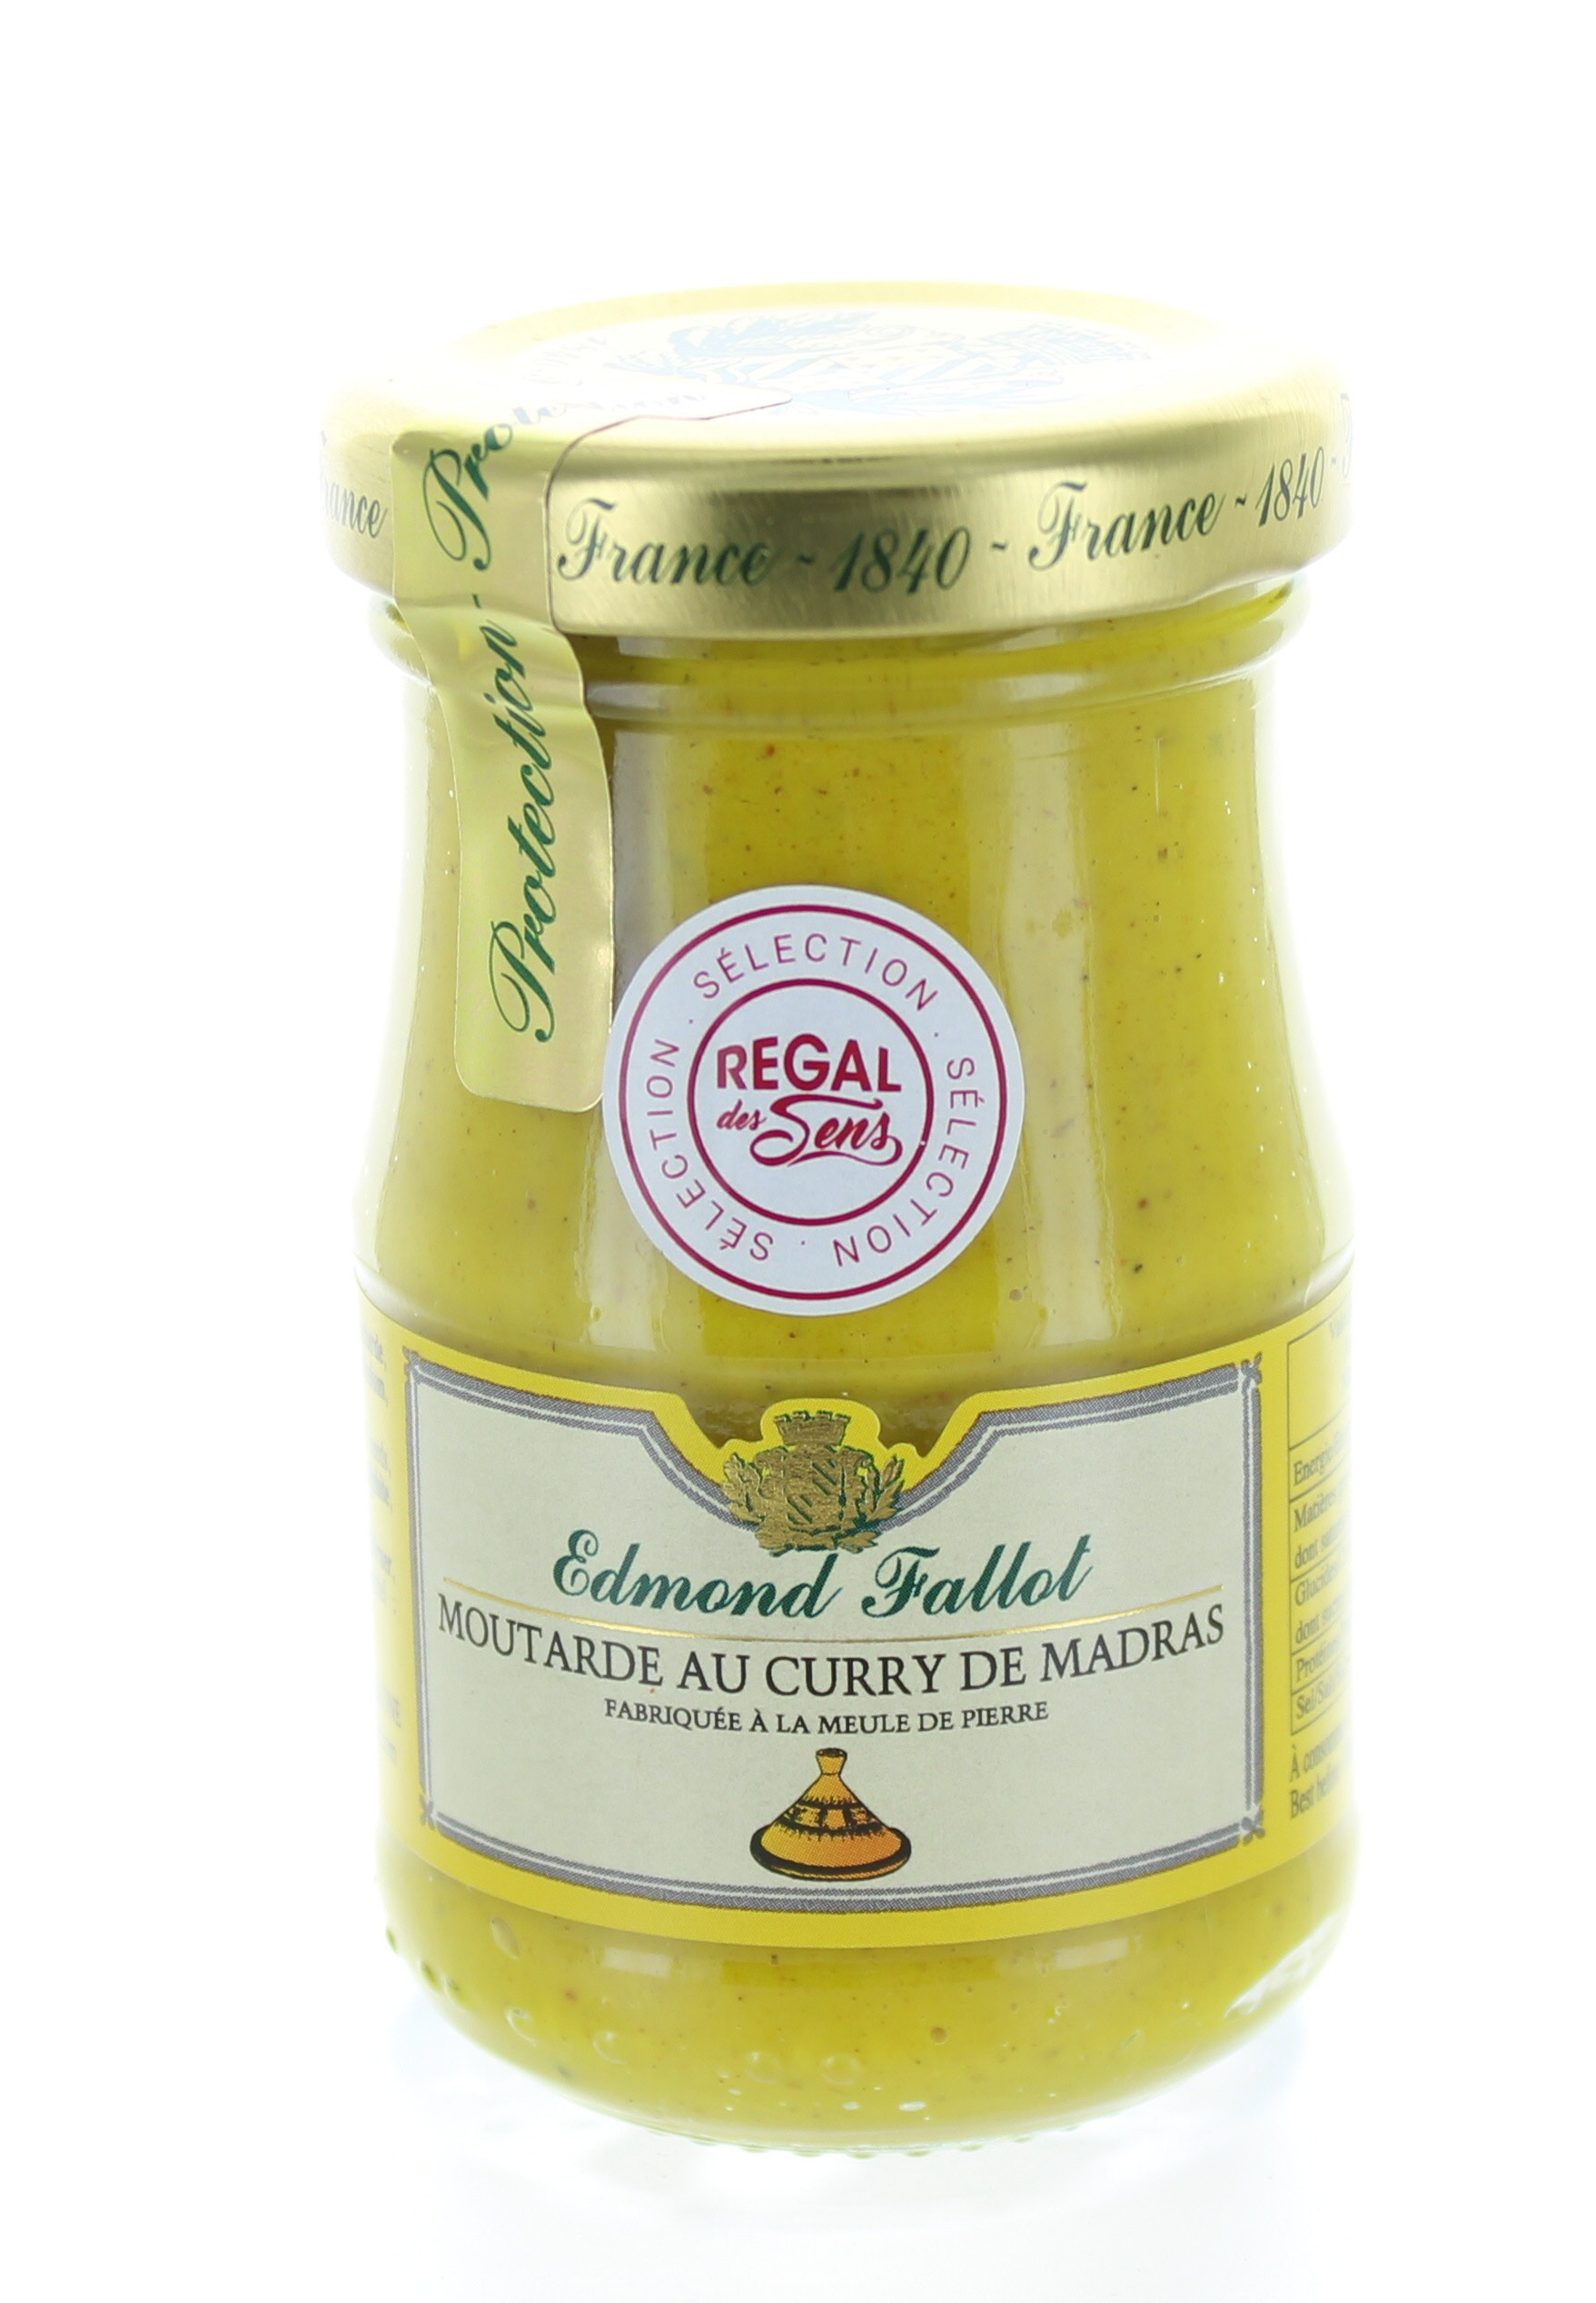 Moutarde au curry madras